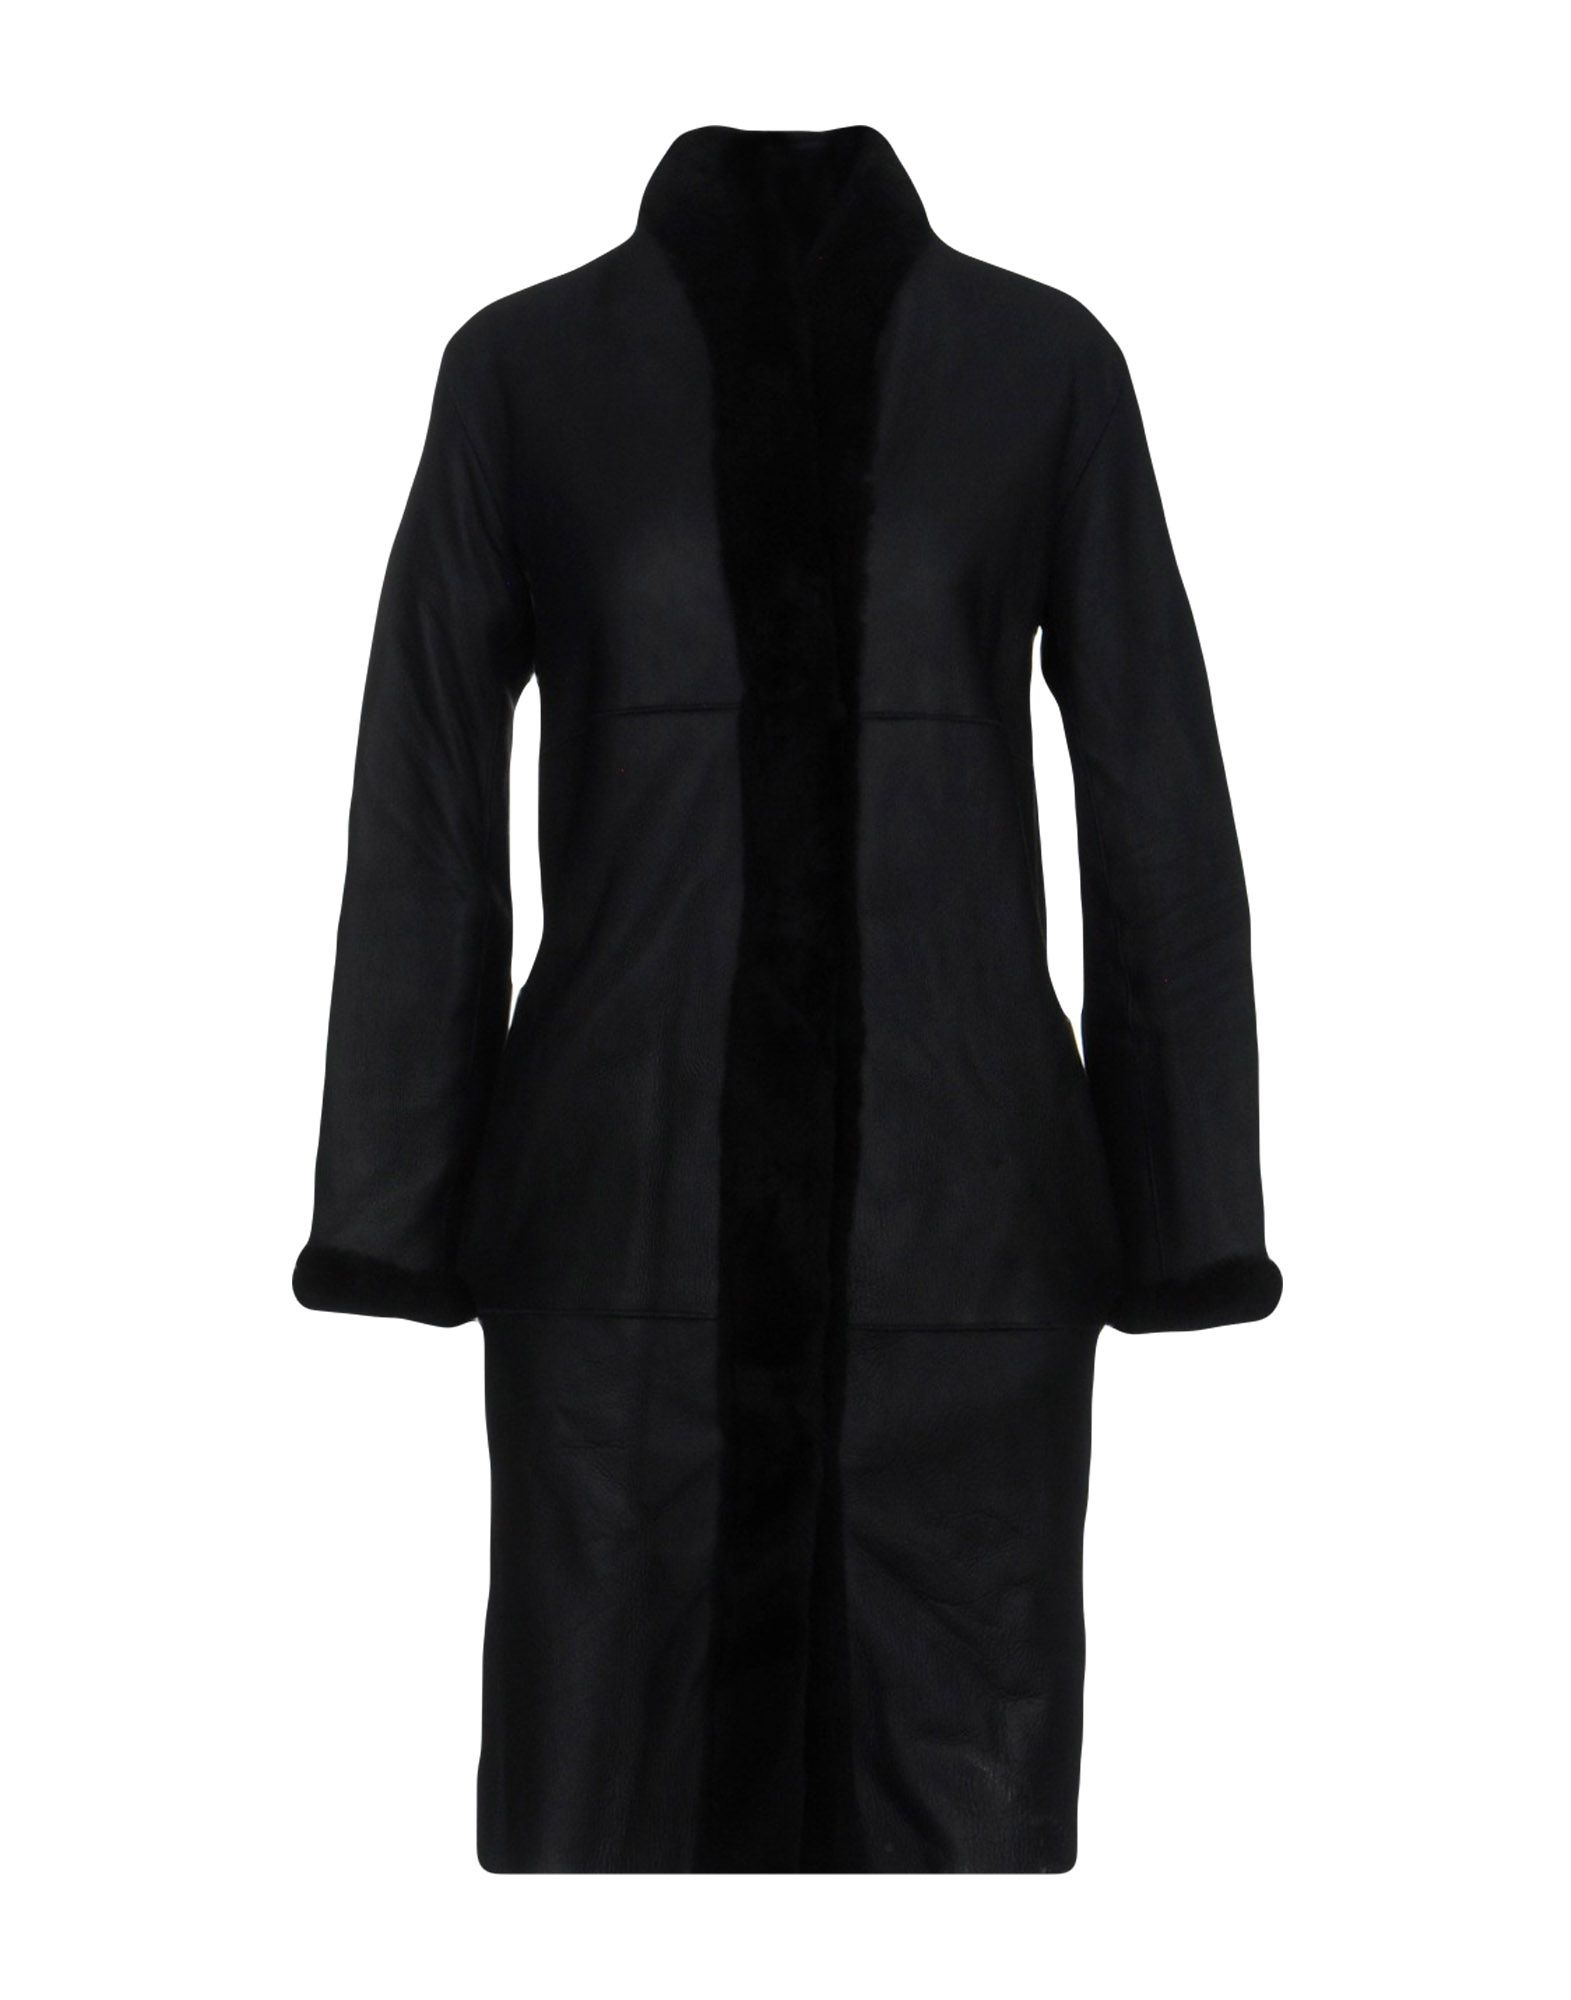 IRIS & INK Leather Jacket in Black